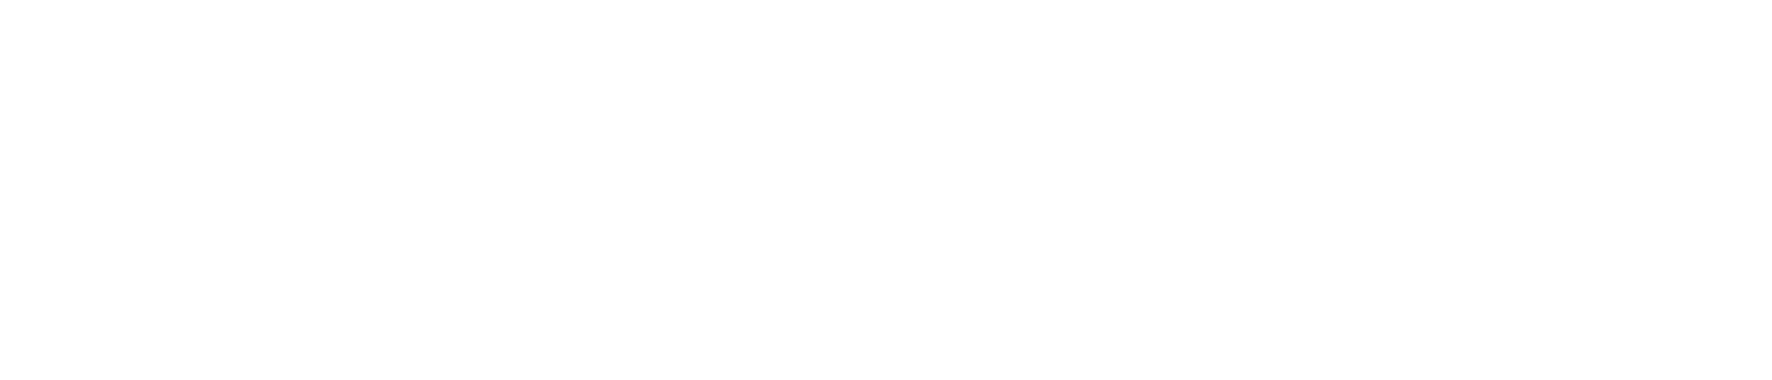 logo manualle